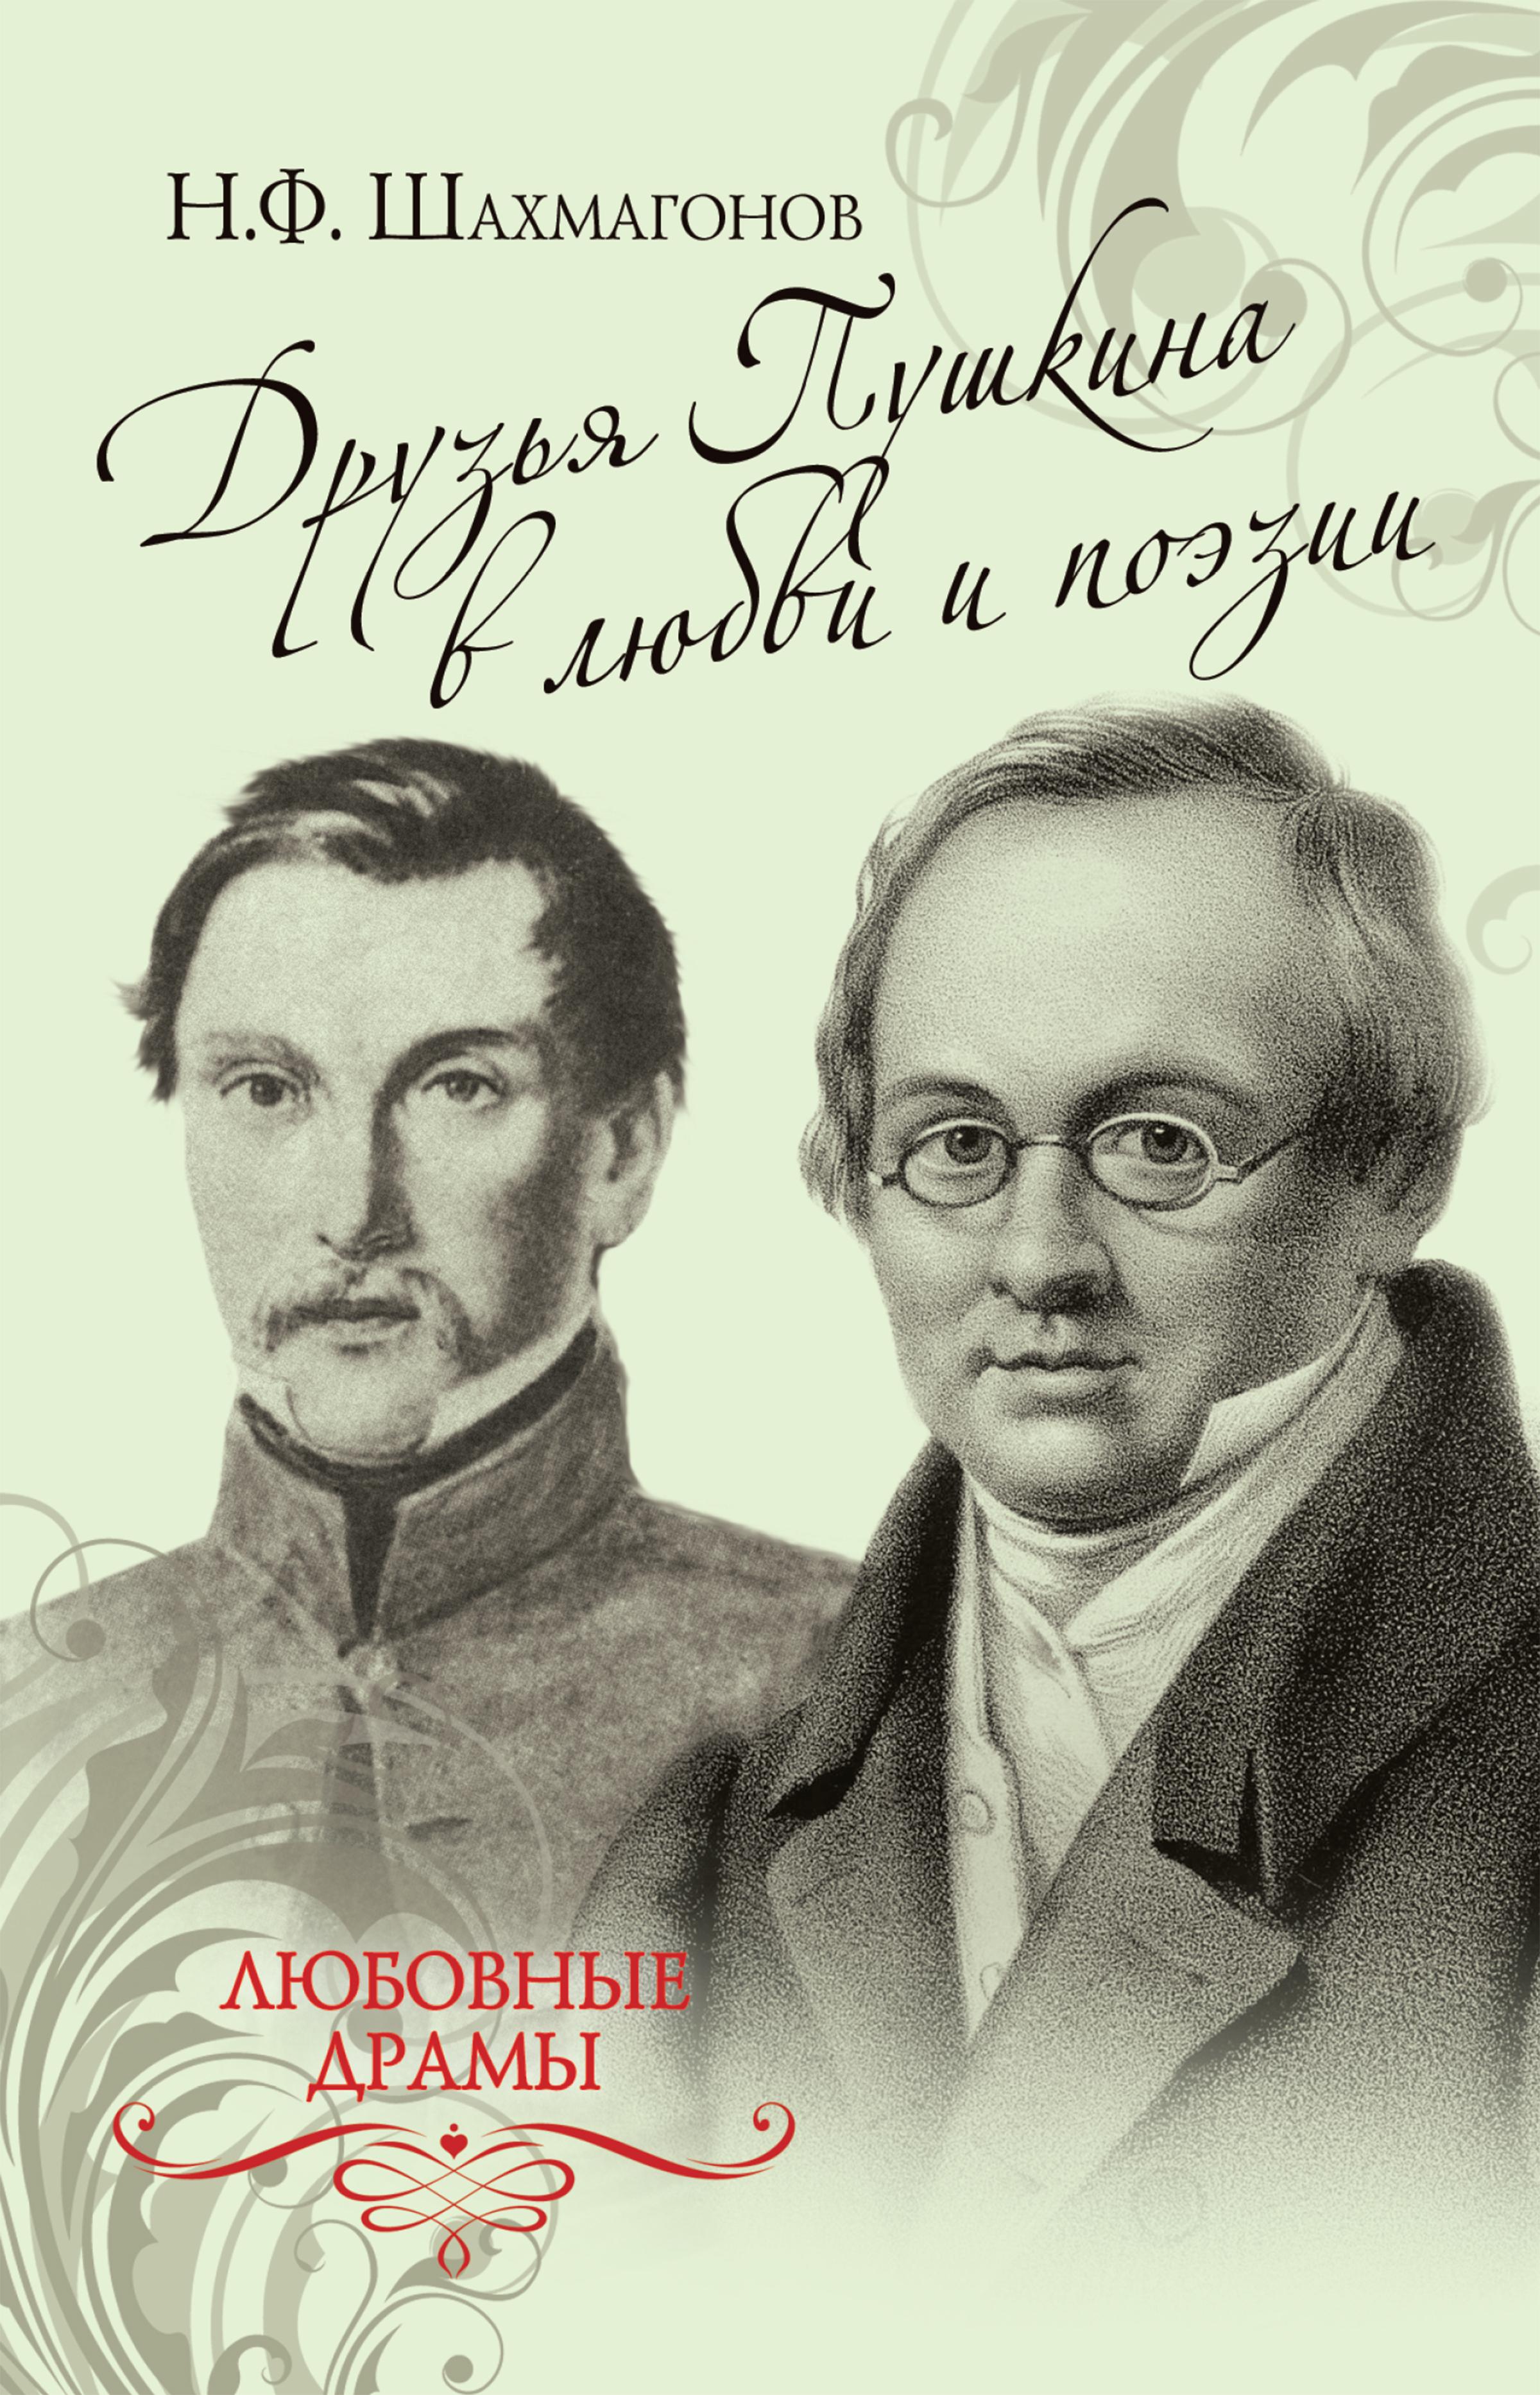 все цены на Николай Шахмагонов Друзья Пушкина в любви и поэзии онлайн